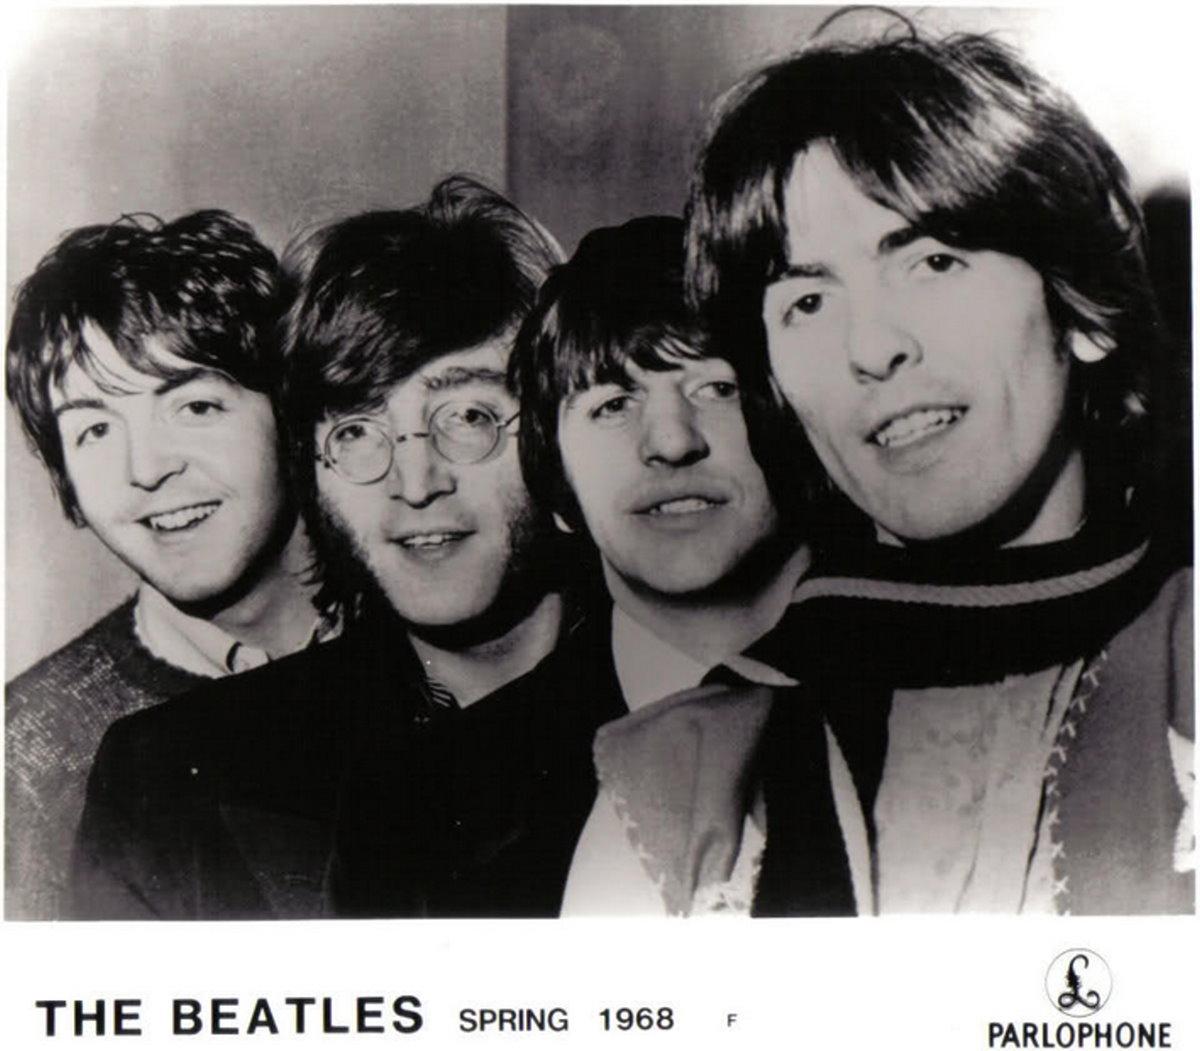 The Beatles Promofoto 1968